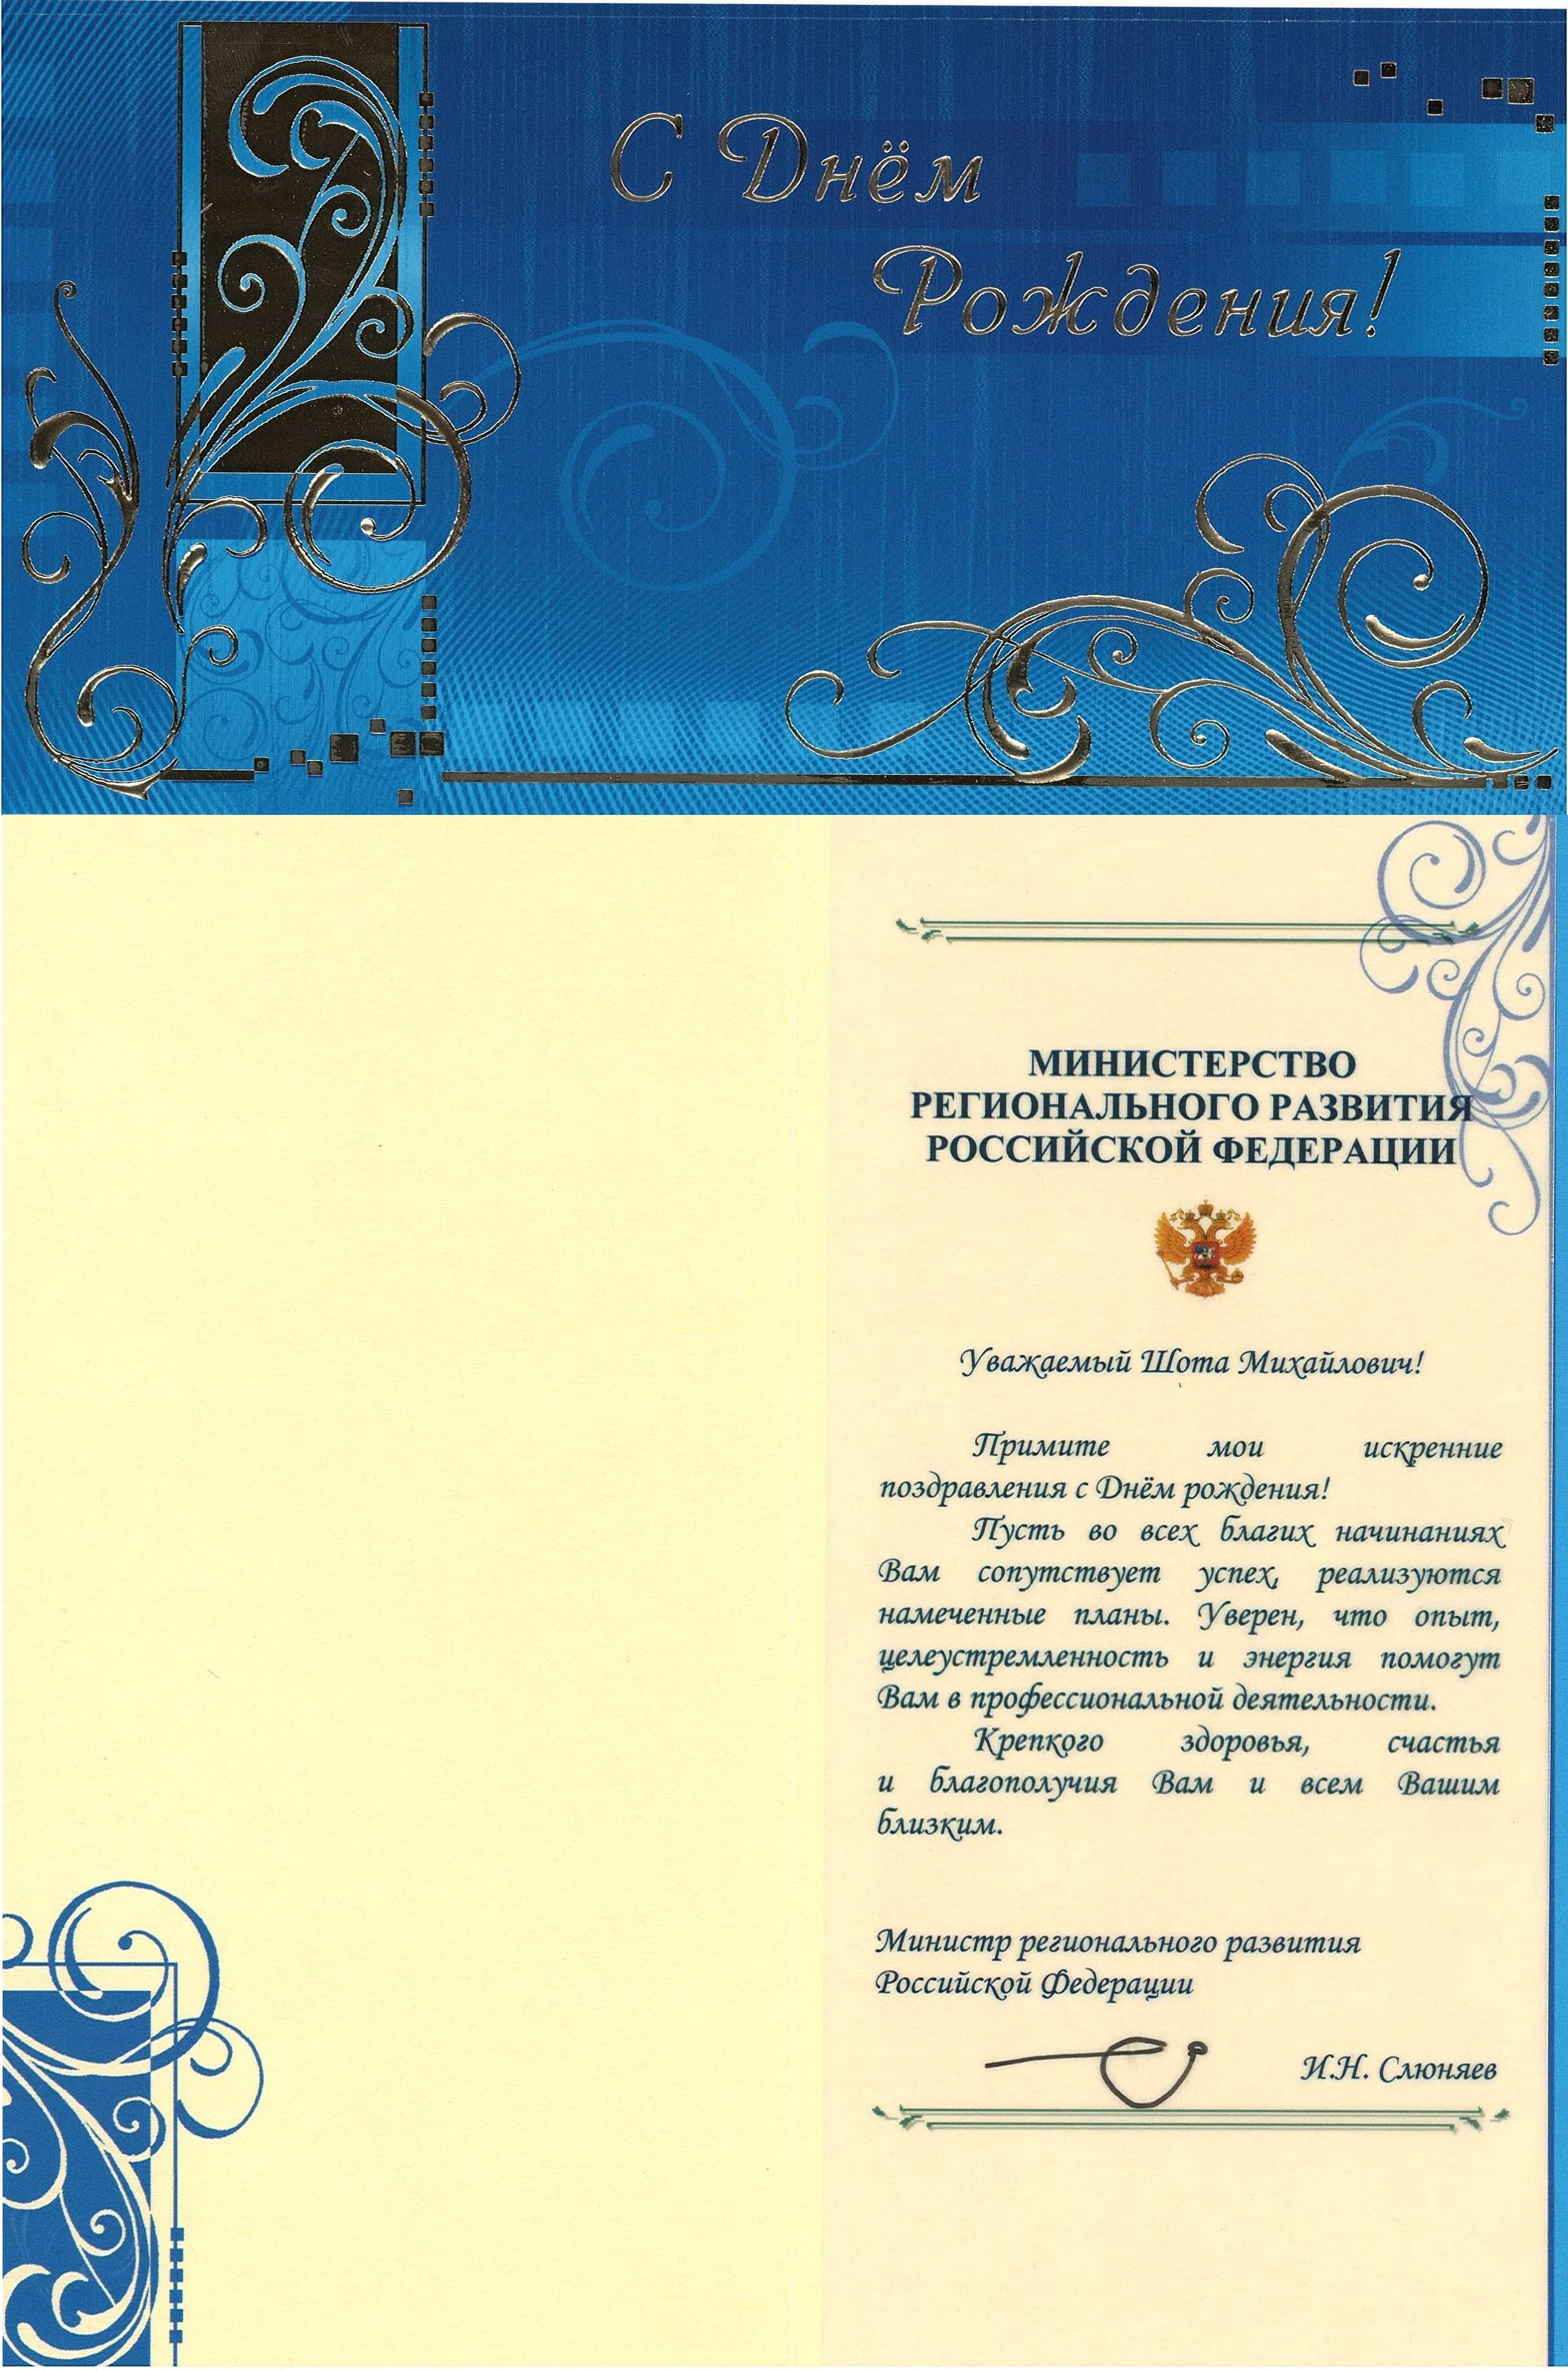 Поздравление с юбилеем от министра образования